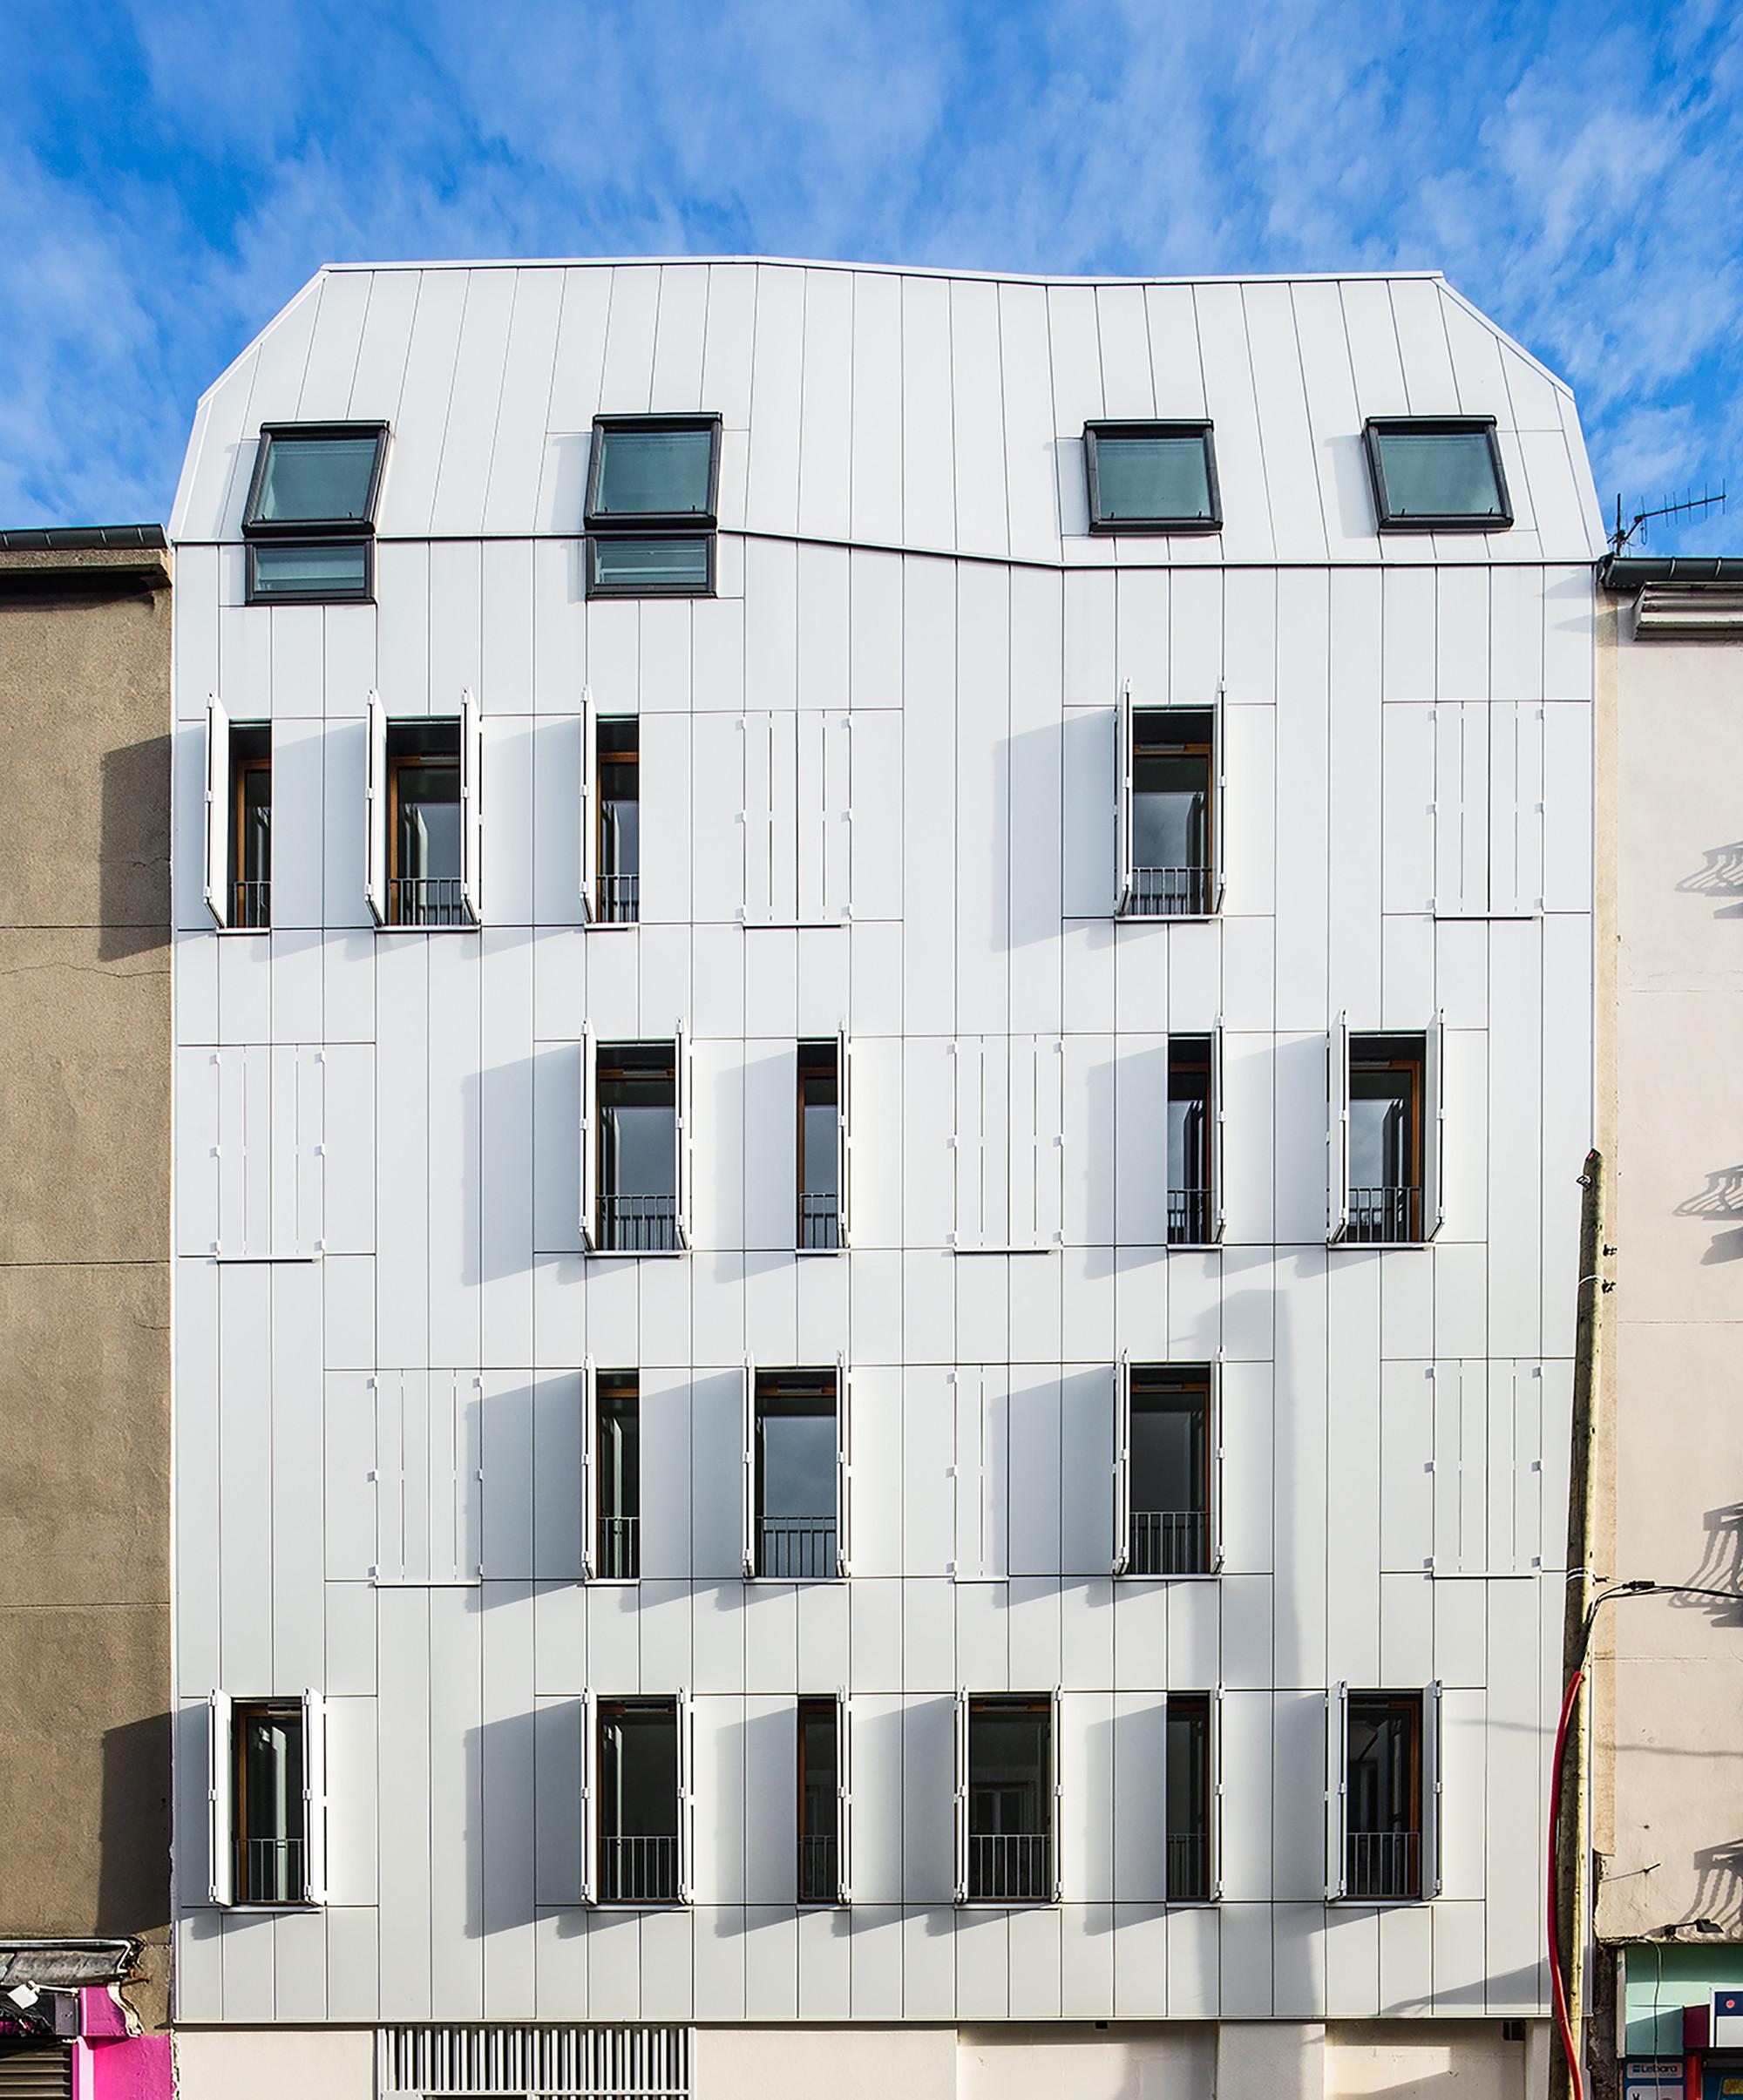 Galer a de edificio de viviendas de madera jtb for Viviendas en madera